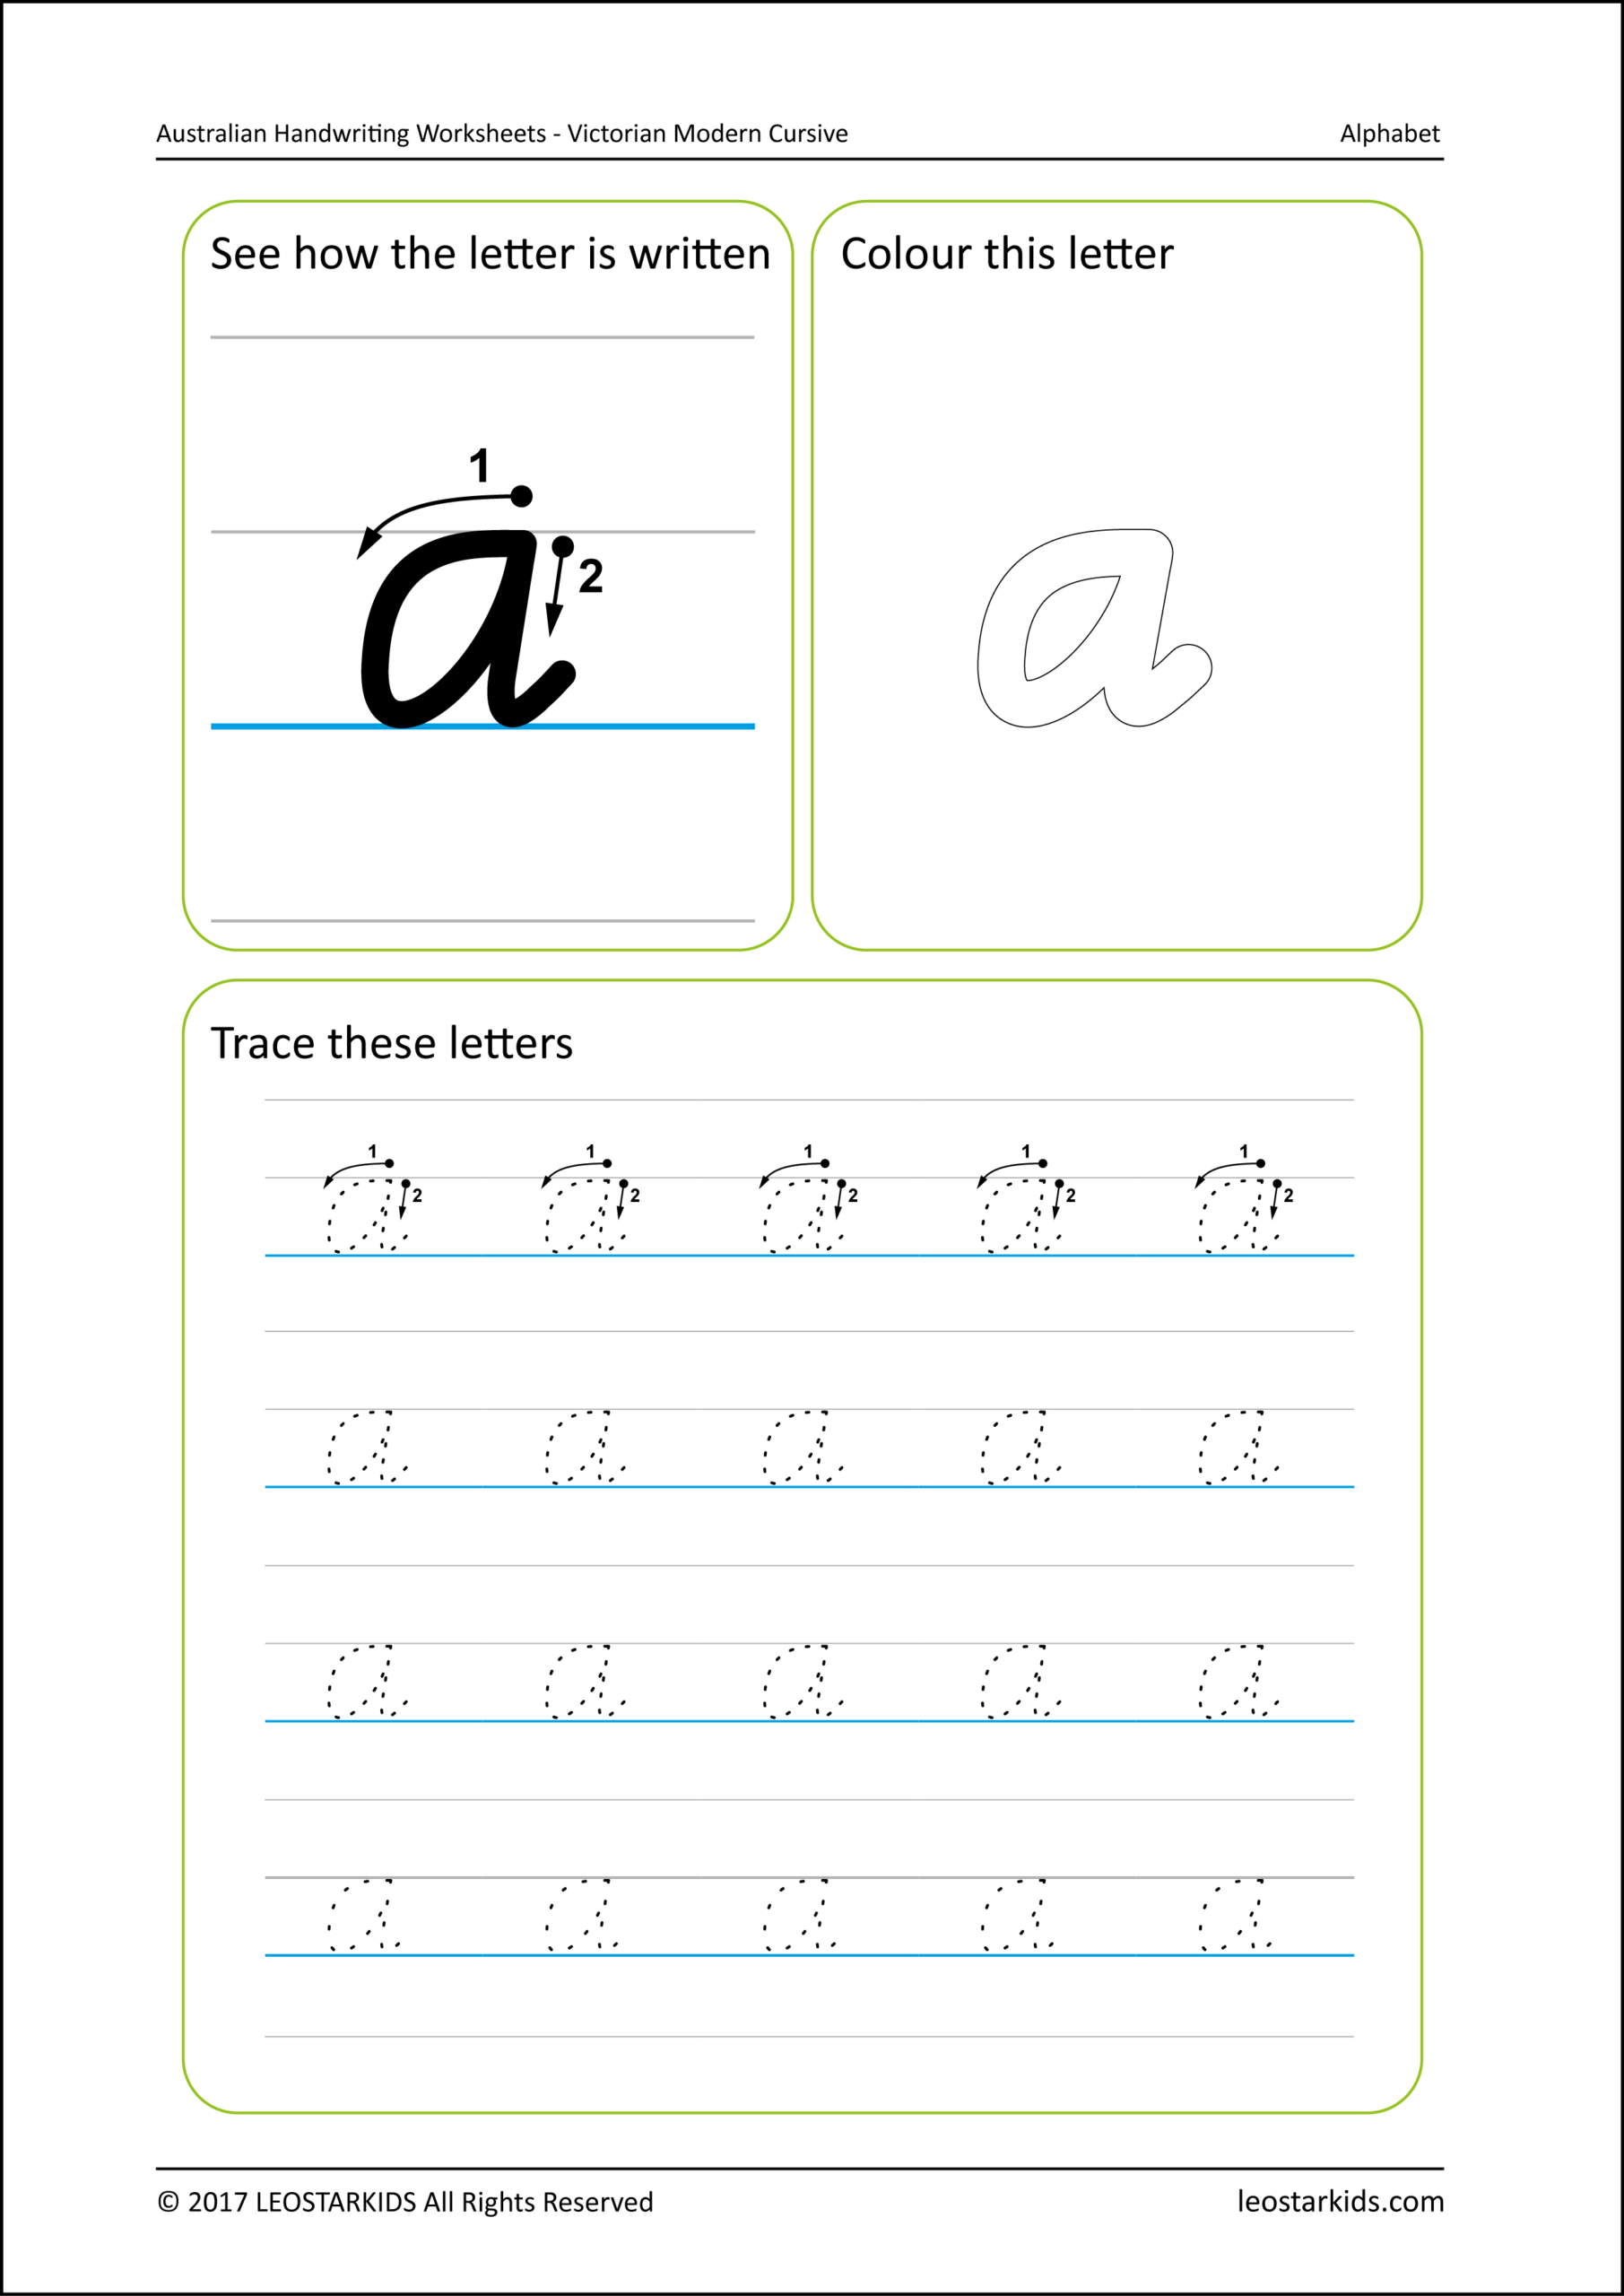 Australian Handwriting Worksheets - Victorian Modern Cursive pertaining to Name Tracing Nsw